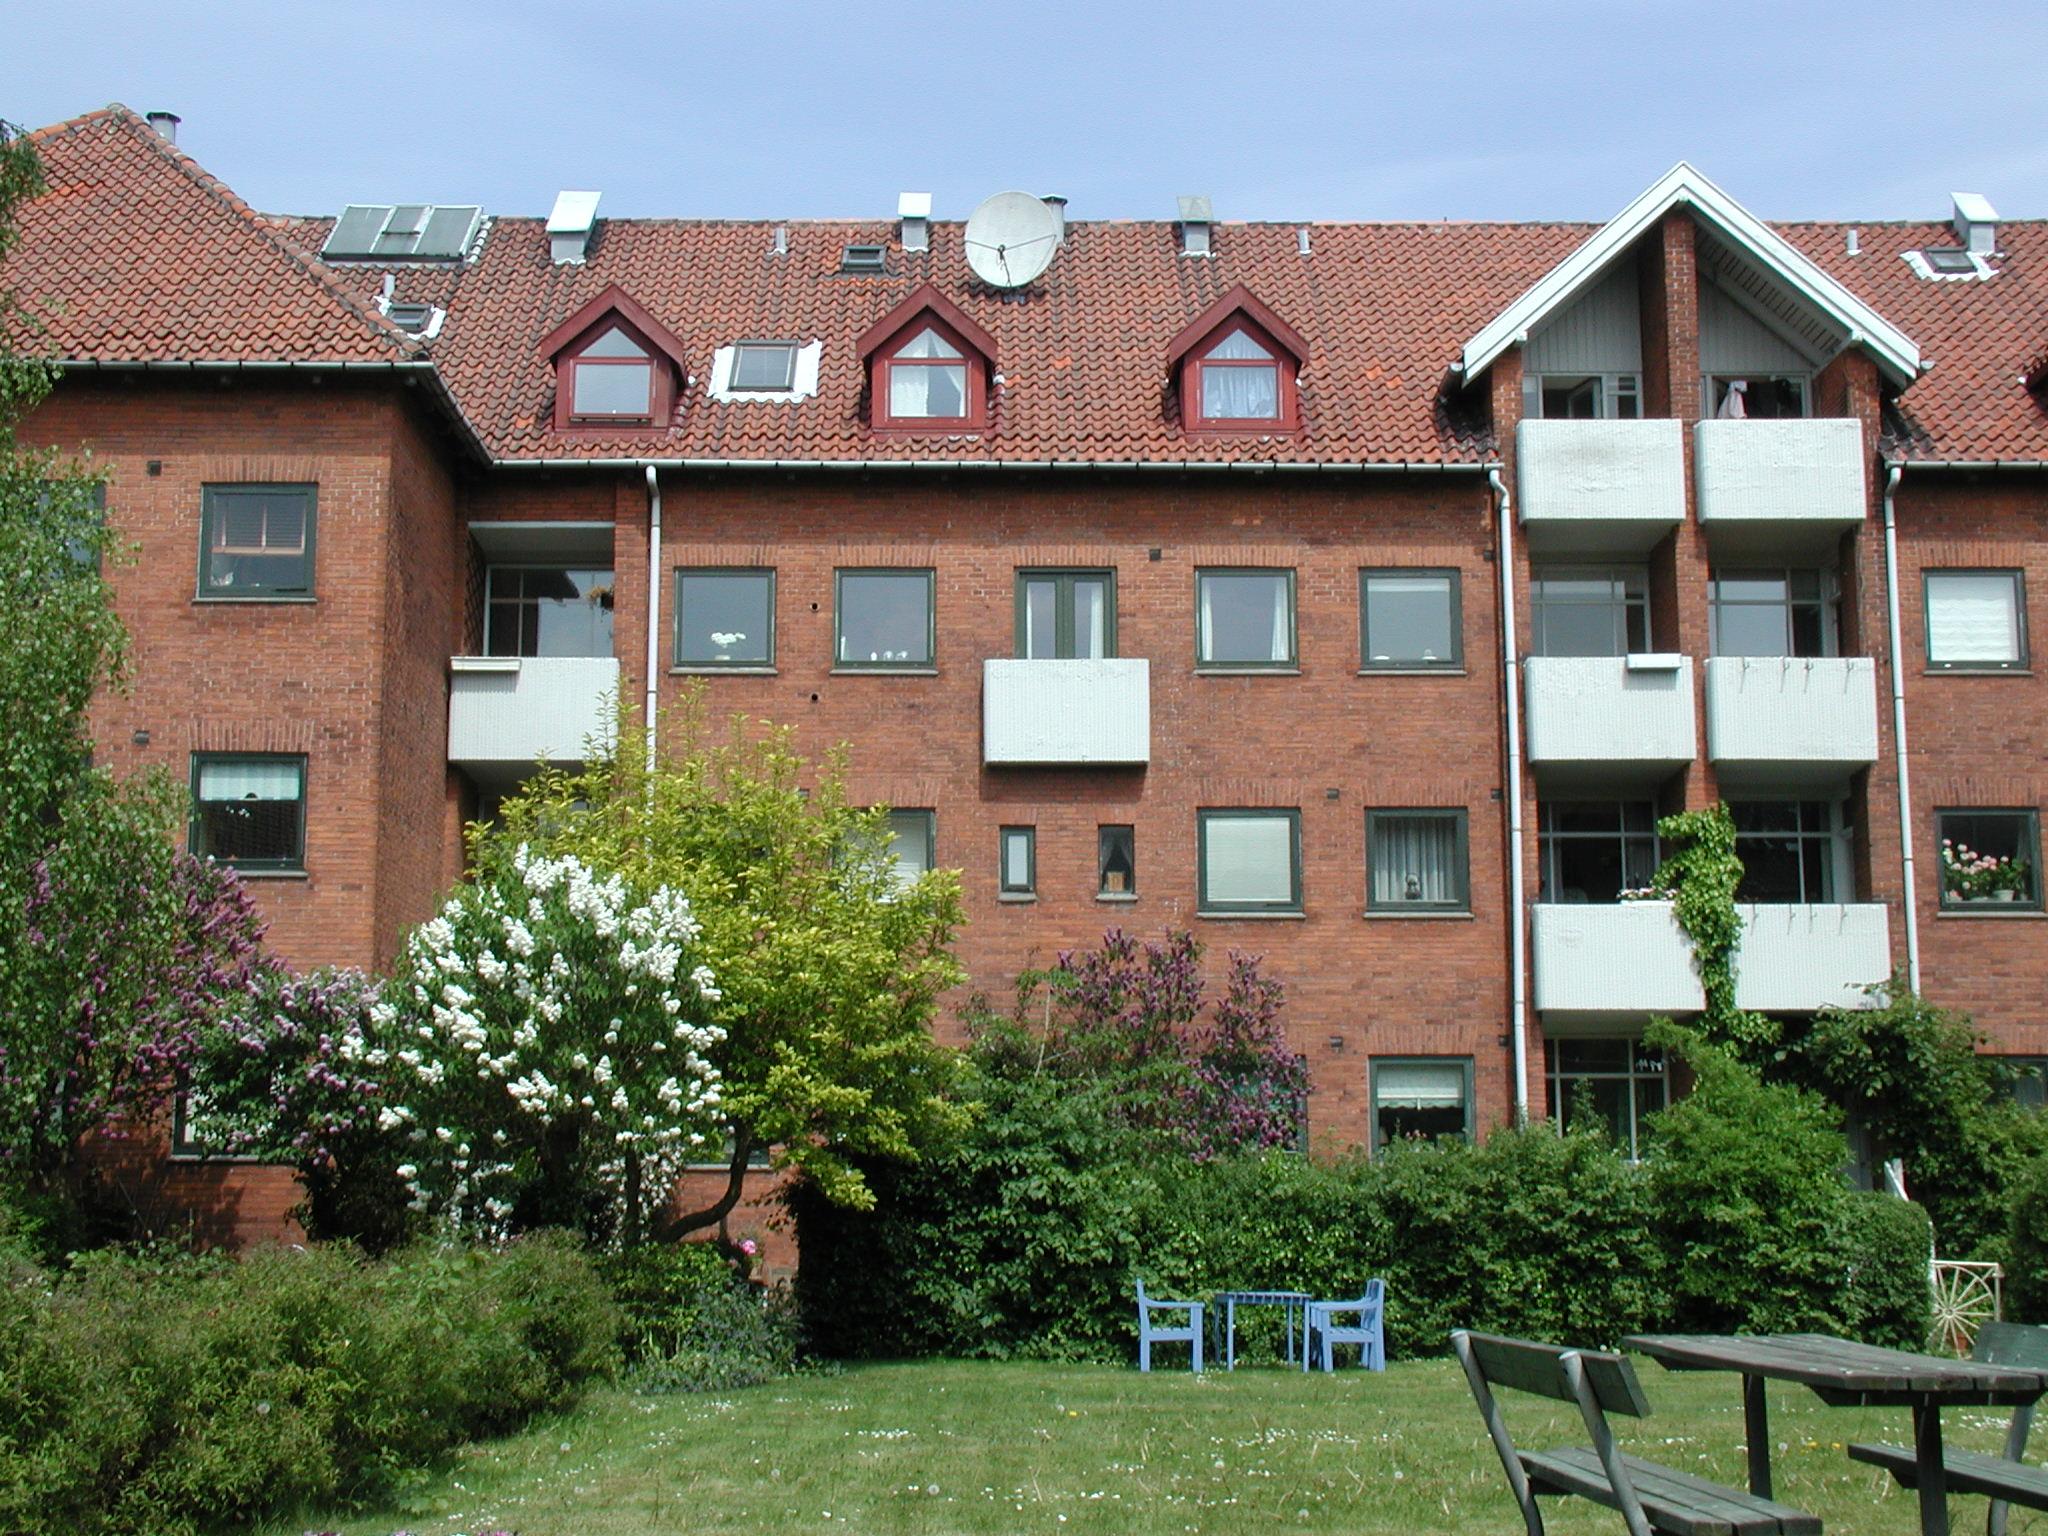 Få 3 gratis tilbud på en boligadvokat